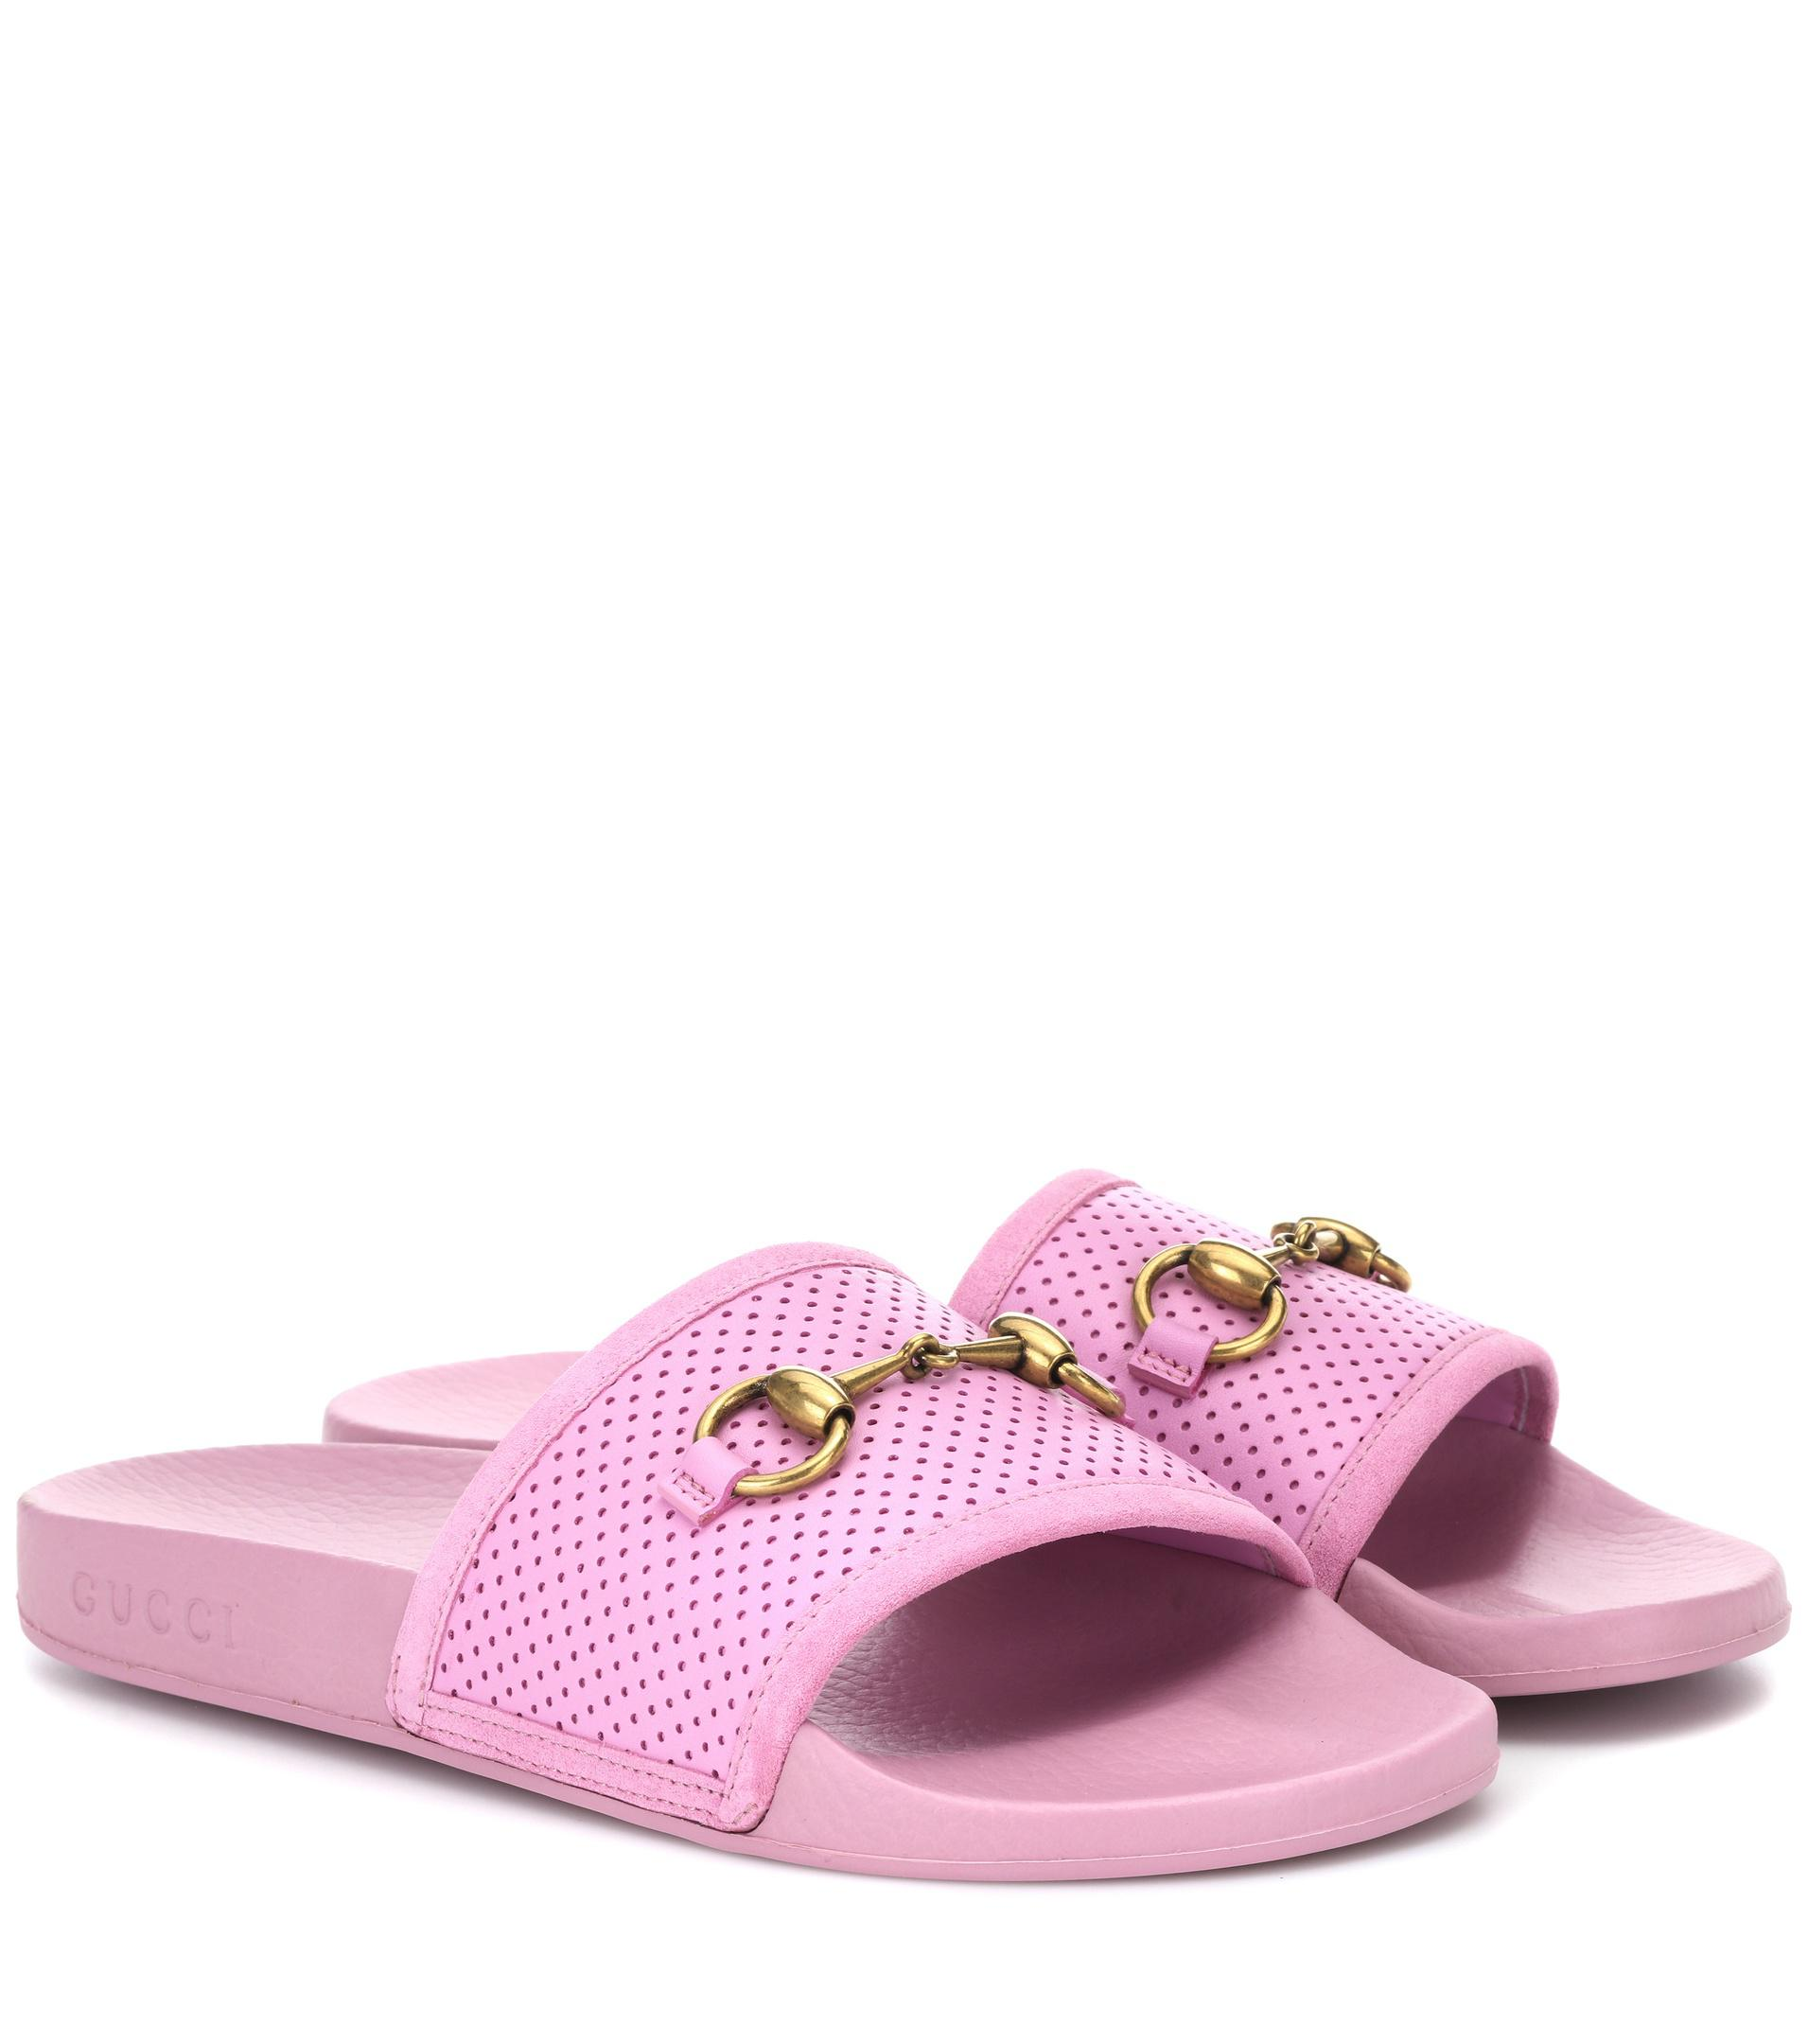 7496b18c9fc Gucci Horsebit Leather Slides in Pink - Lyst